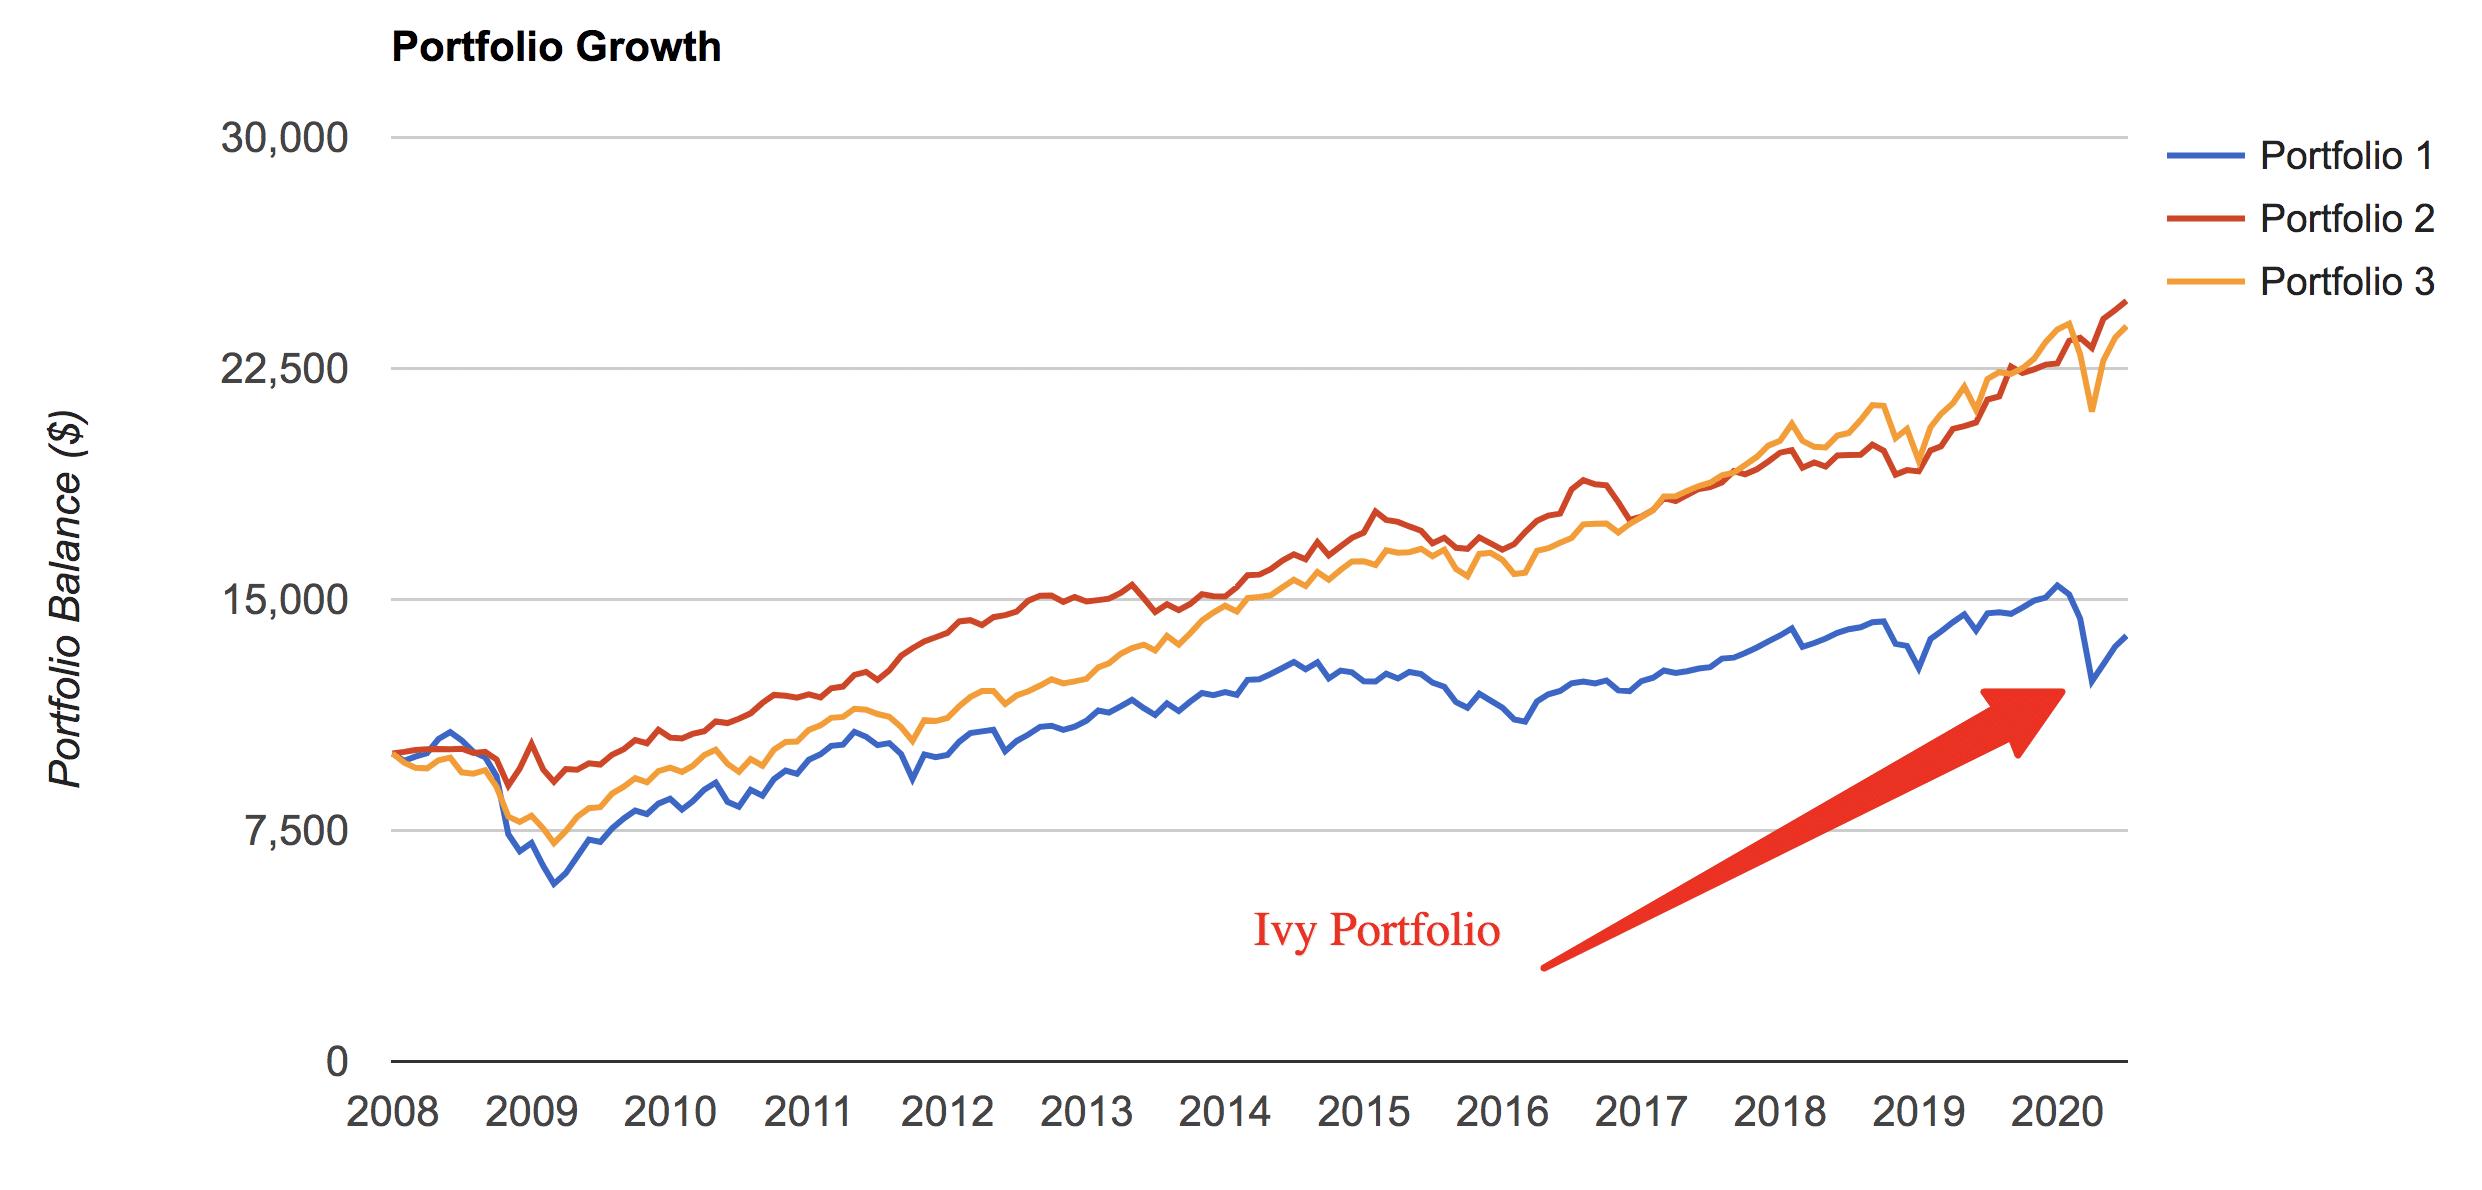 ivy portfolio performance